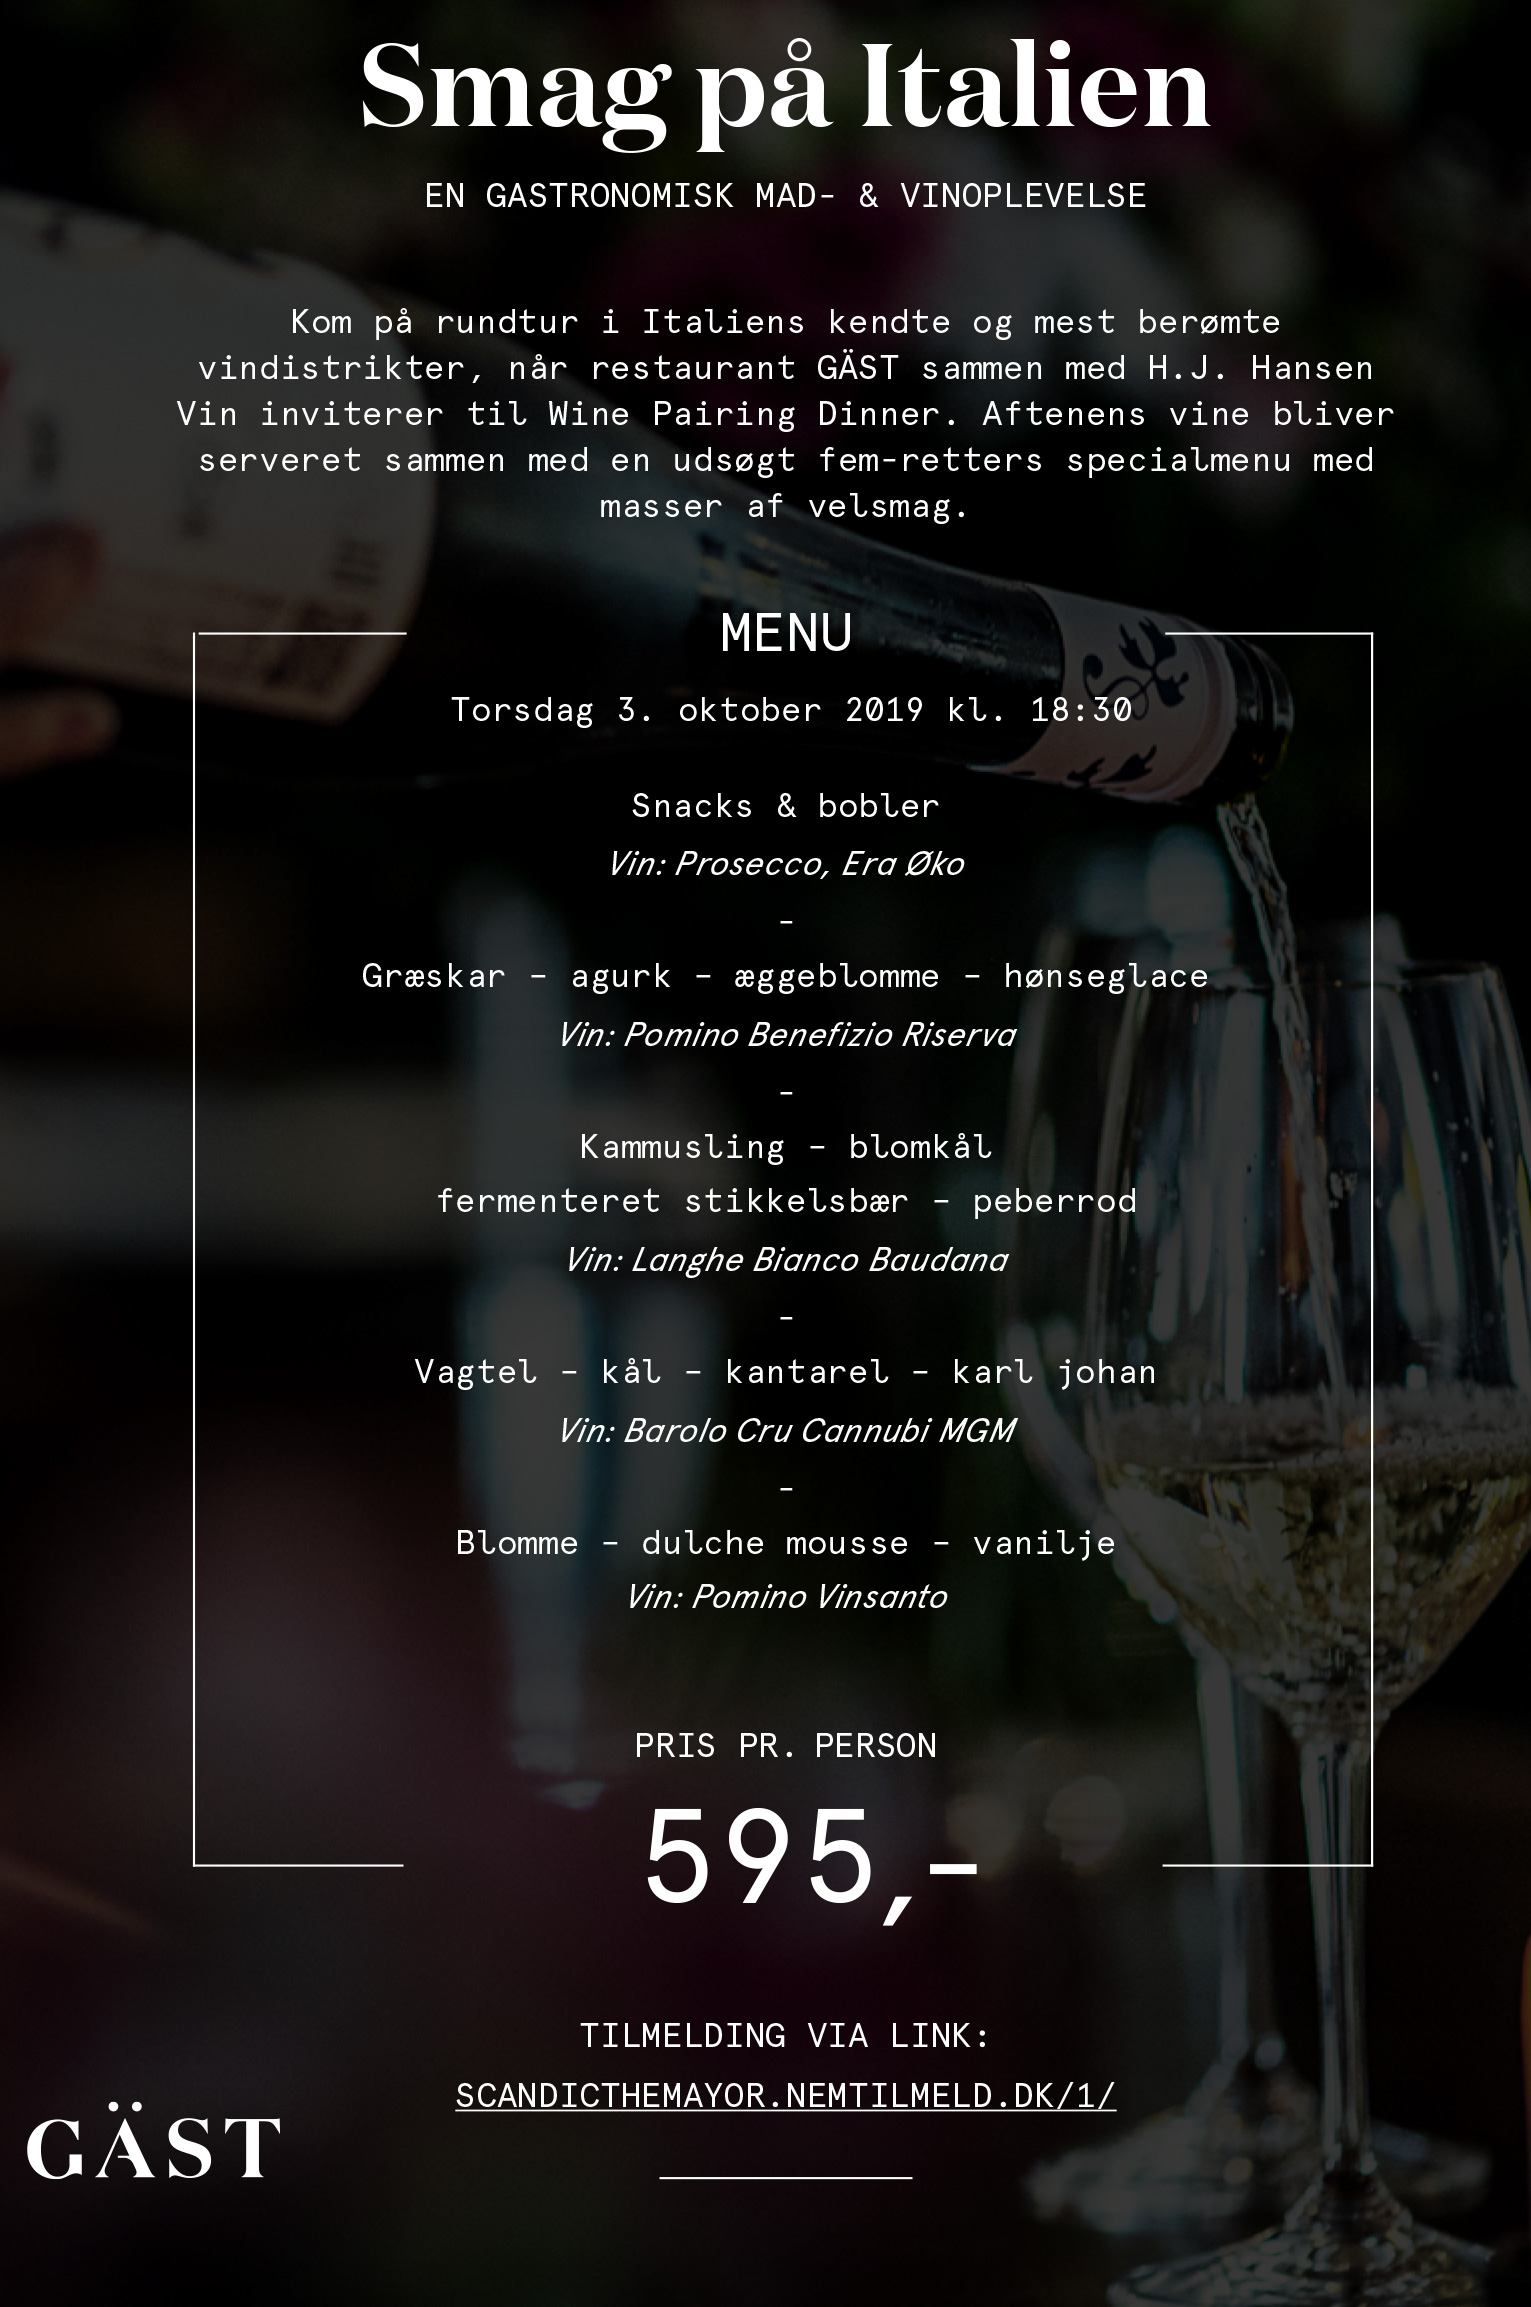 Smag på Italien: Wine Pairing Dinner på Restaurant Gäst